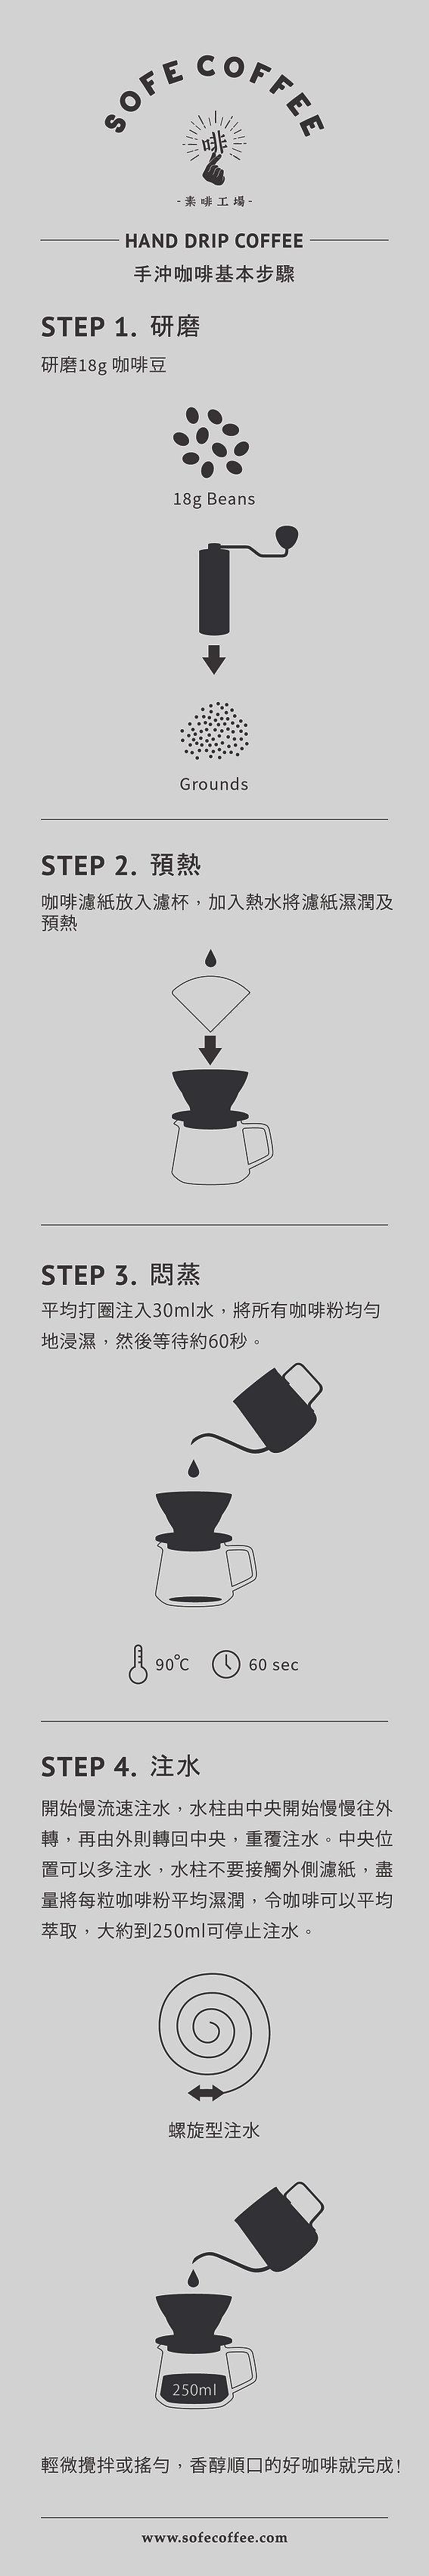 sofe_drip_coffee_menu_online-01-01-01-01-01.jpg